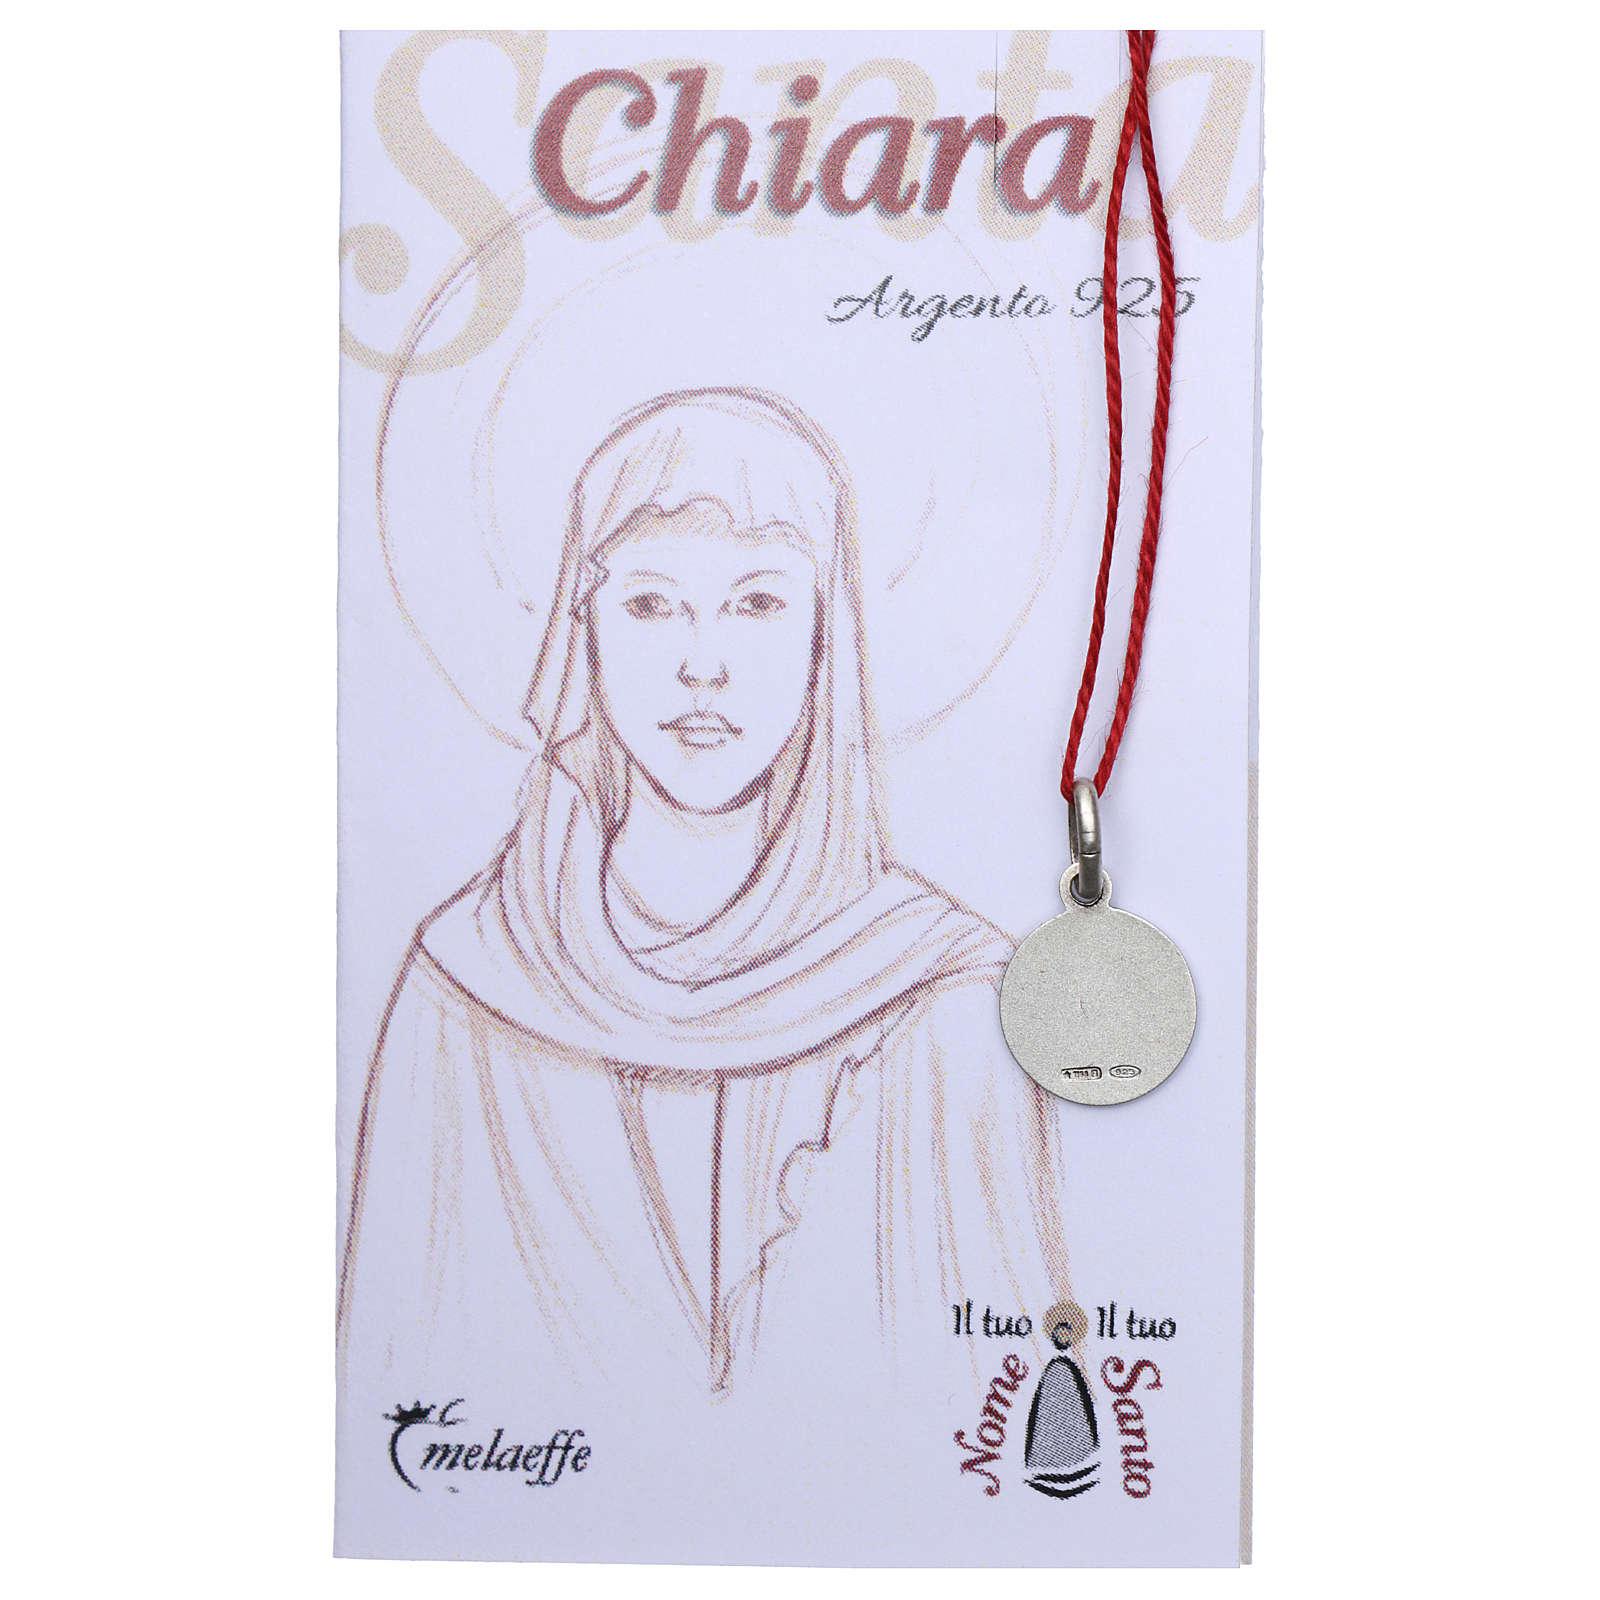 Medaglia Santa Chiara Argento 925 rodiata 10 mm 4